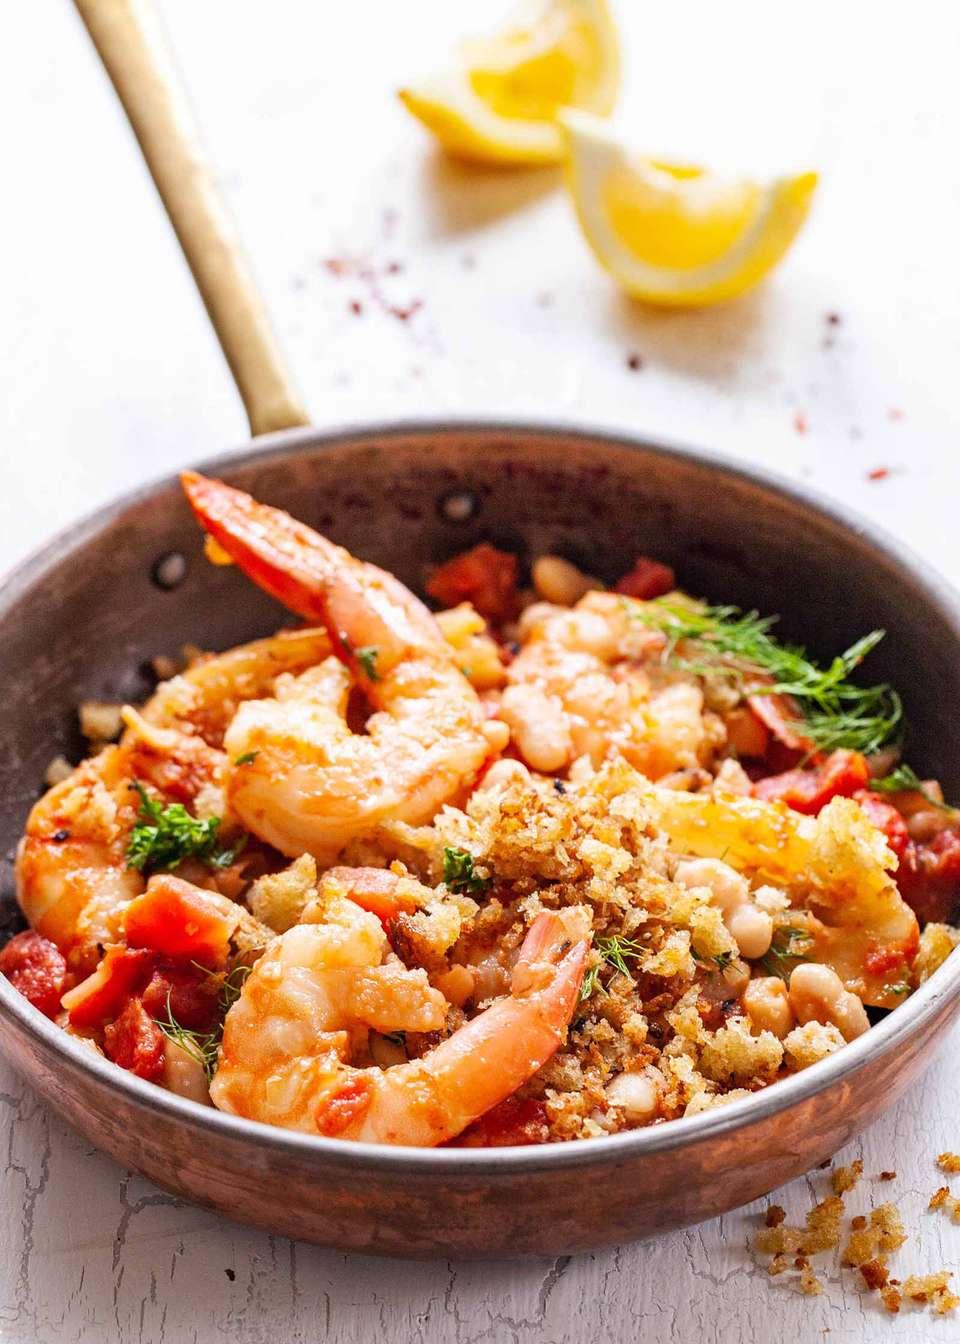 Weeknight Shrimp Dinner - shrimp, breadcrumbs, vegetables, tomatoes and beans in skillet with lemon wedges